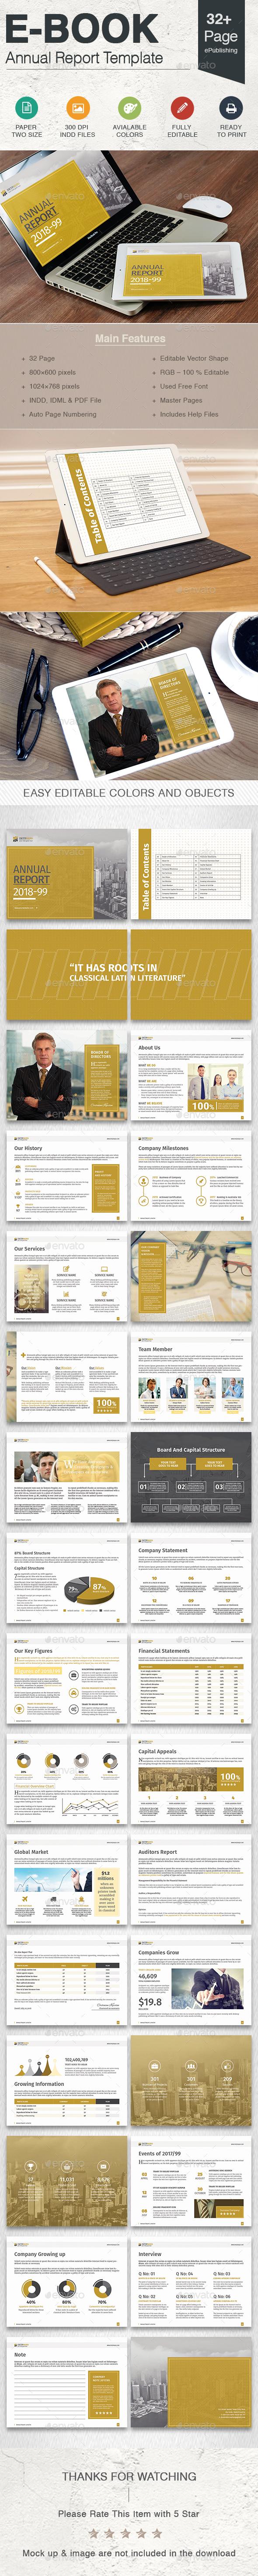 E-Book Annual Report - Digital Books ePublishing